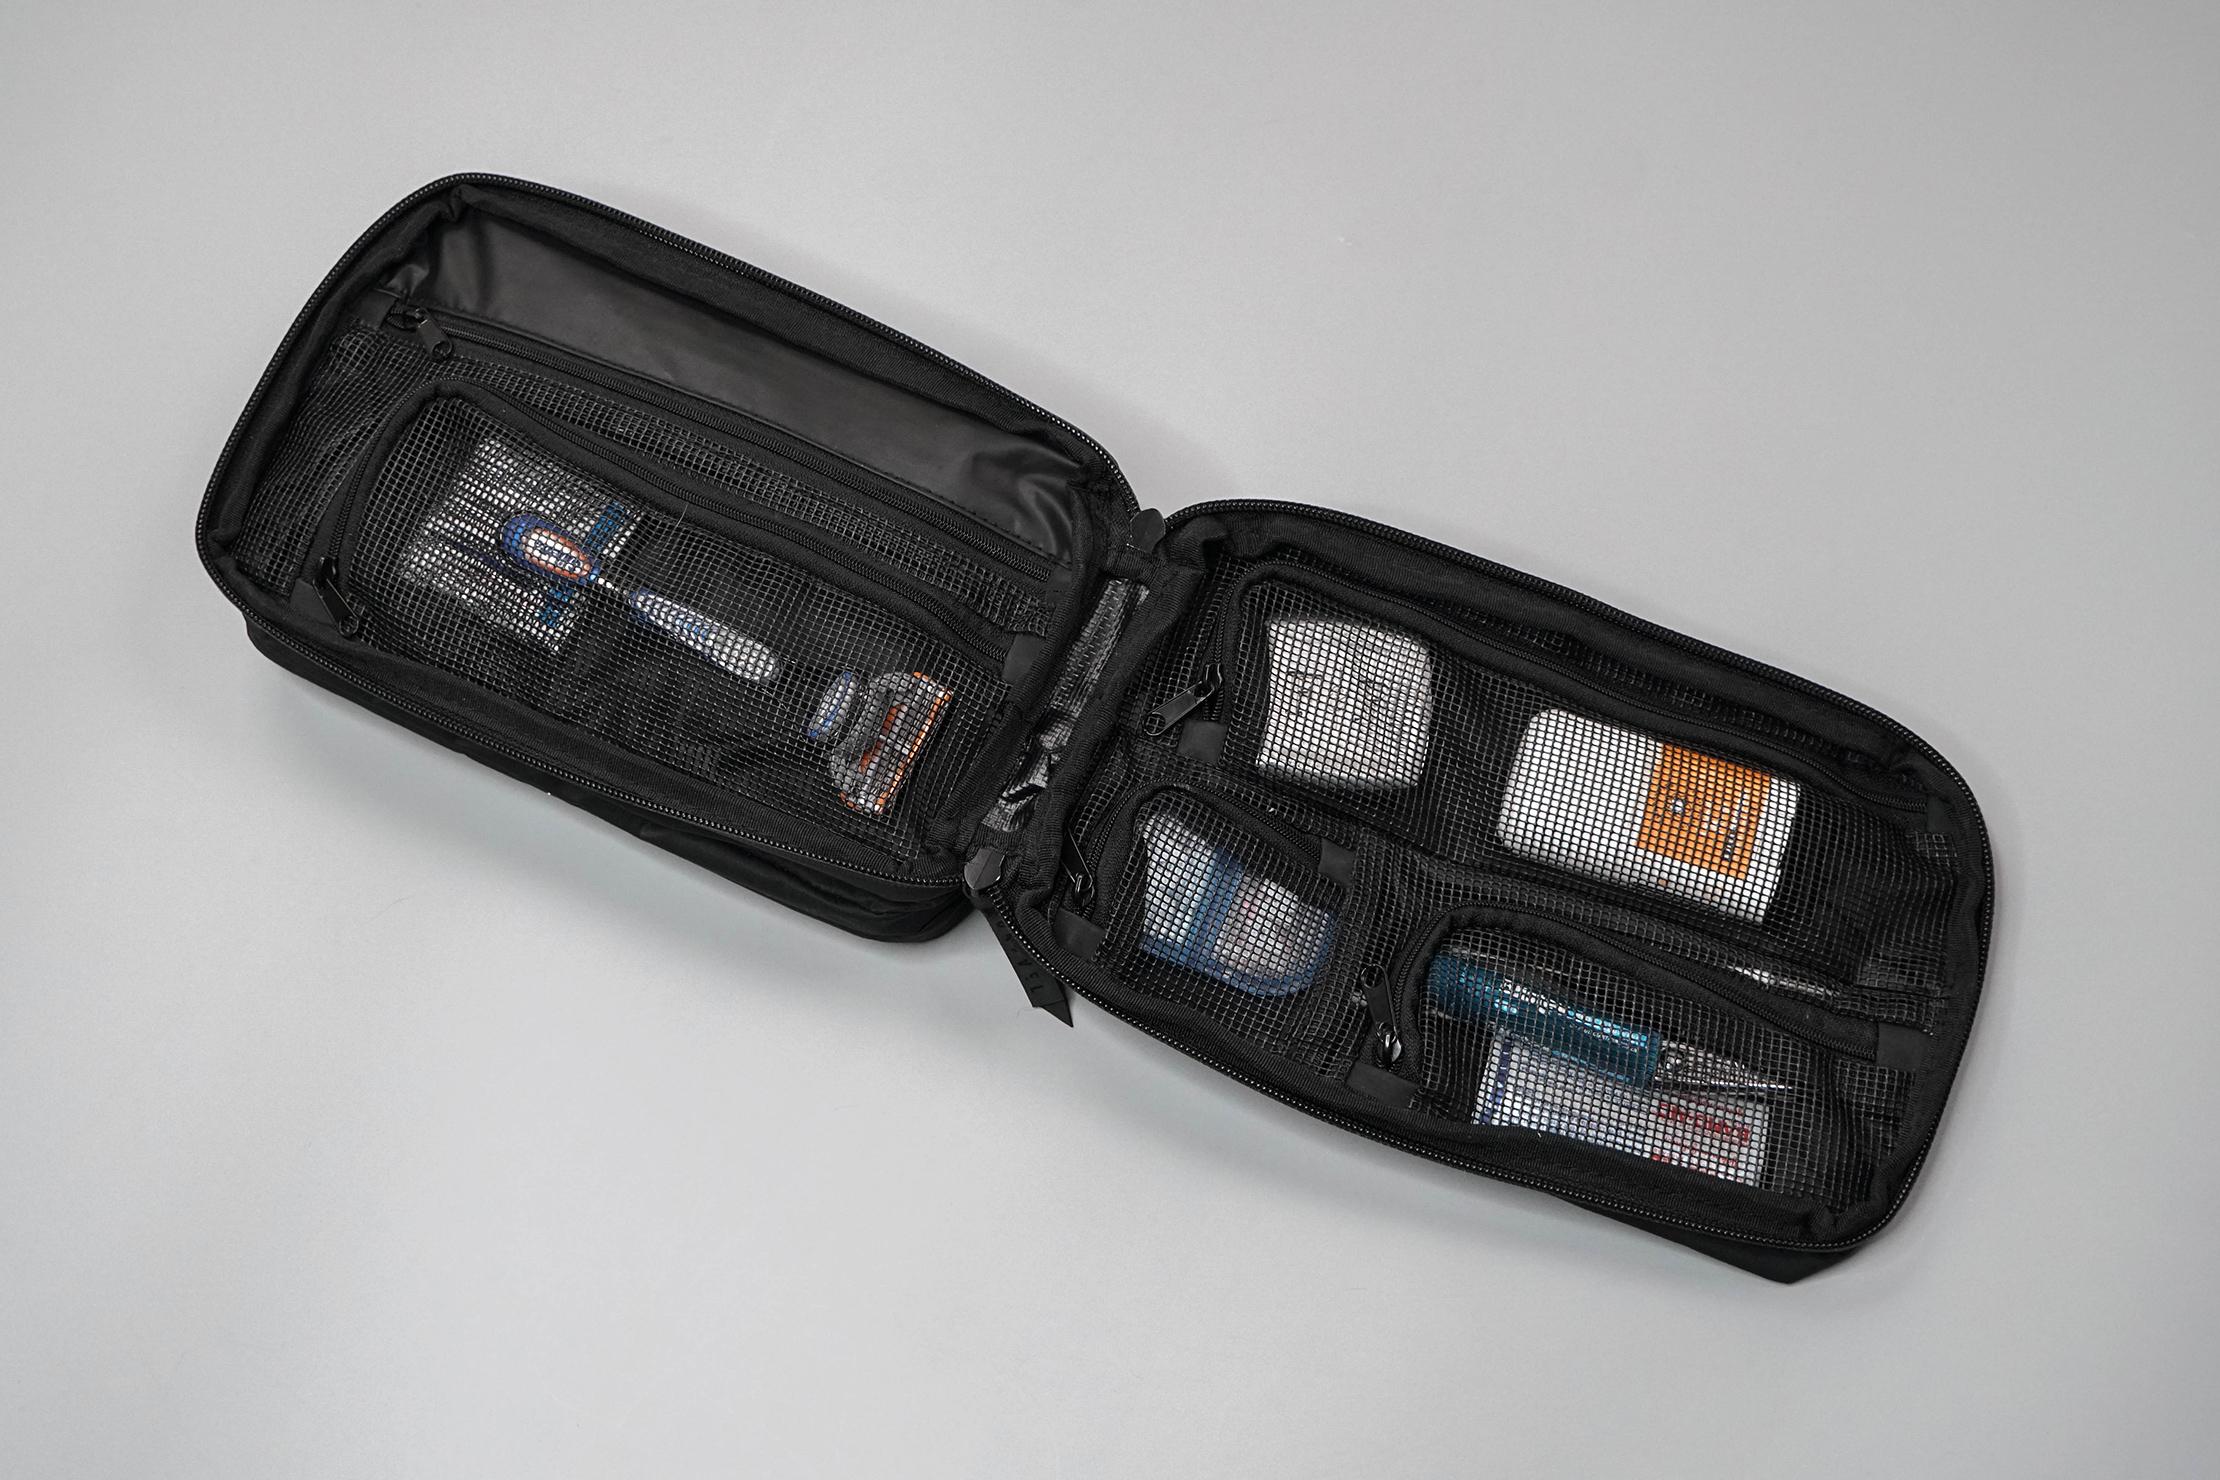 Gravel Explorer Plus Toiletry Bag Open